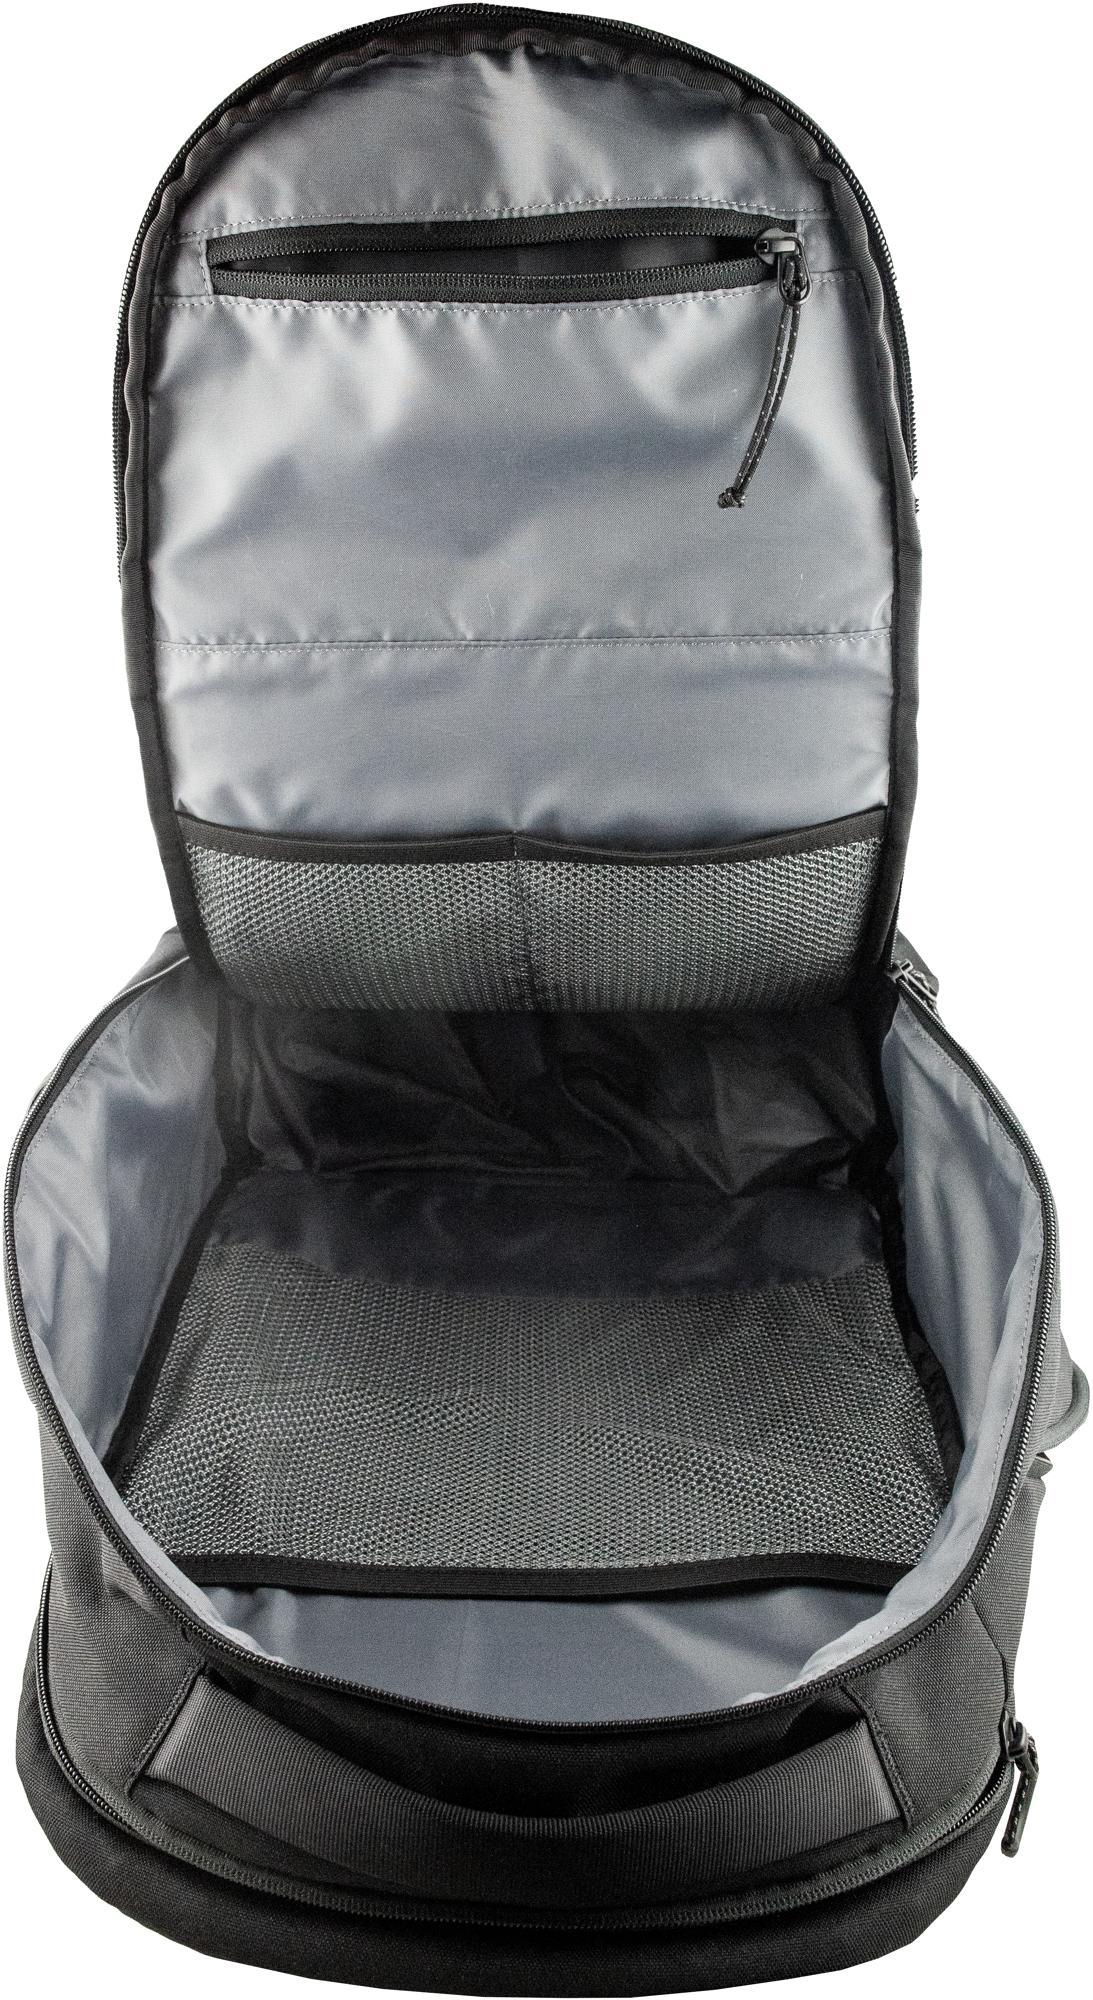 b9cf4fd8a6a89 Finis Rival Swim Backpack, black (3.25.113.101) von FINIS bei ...